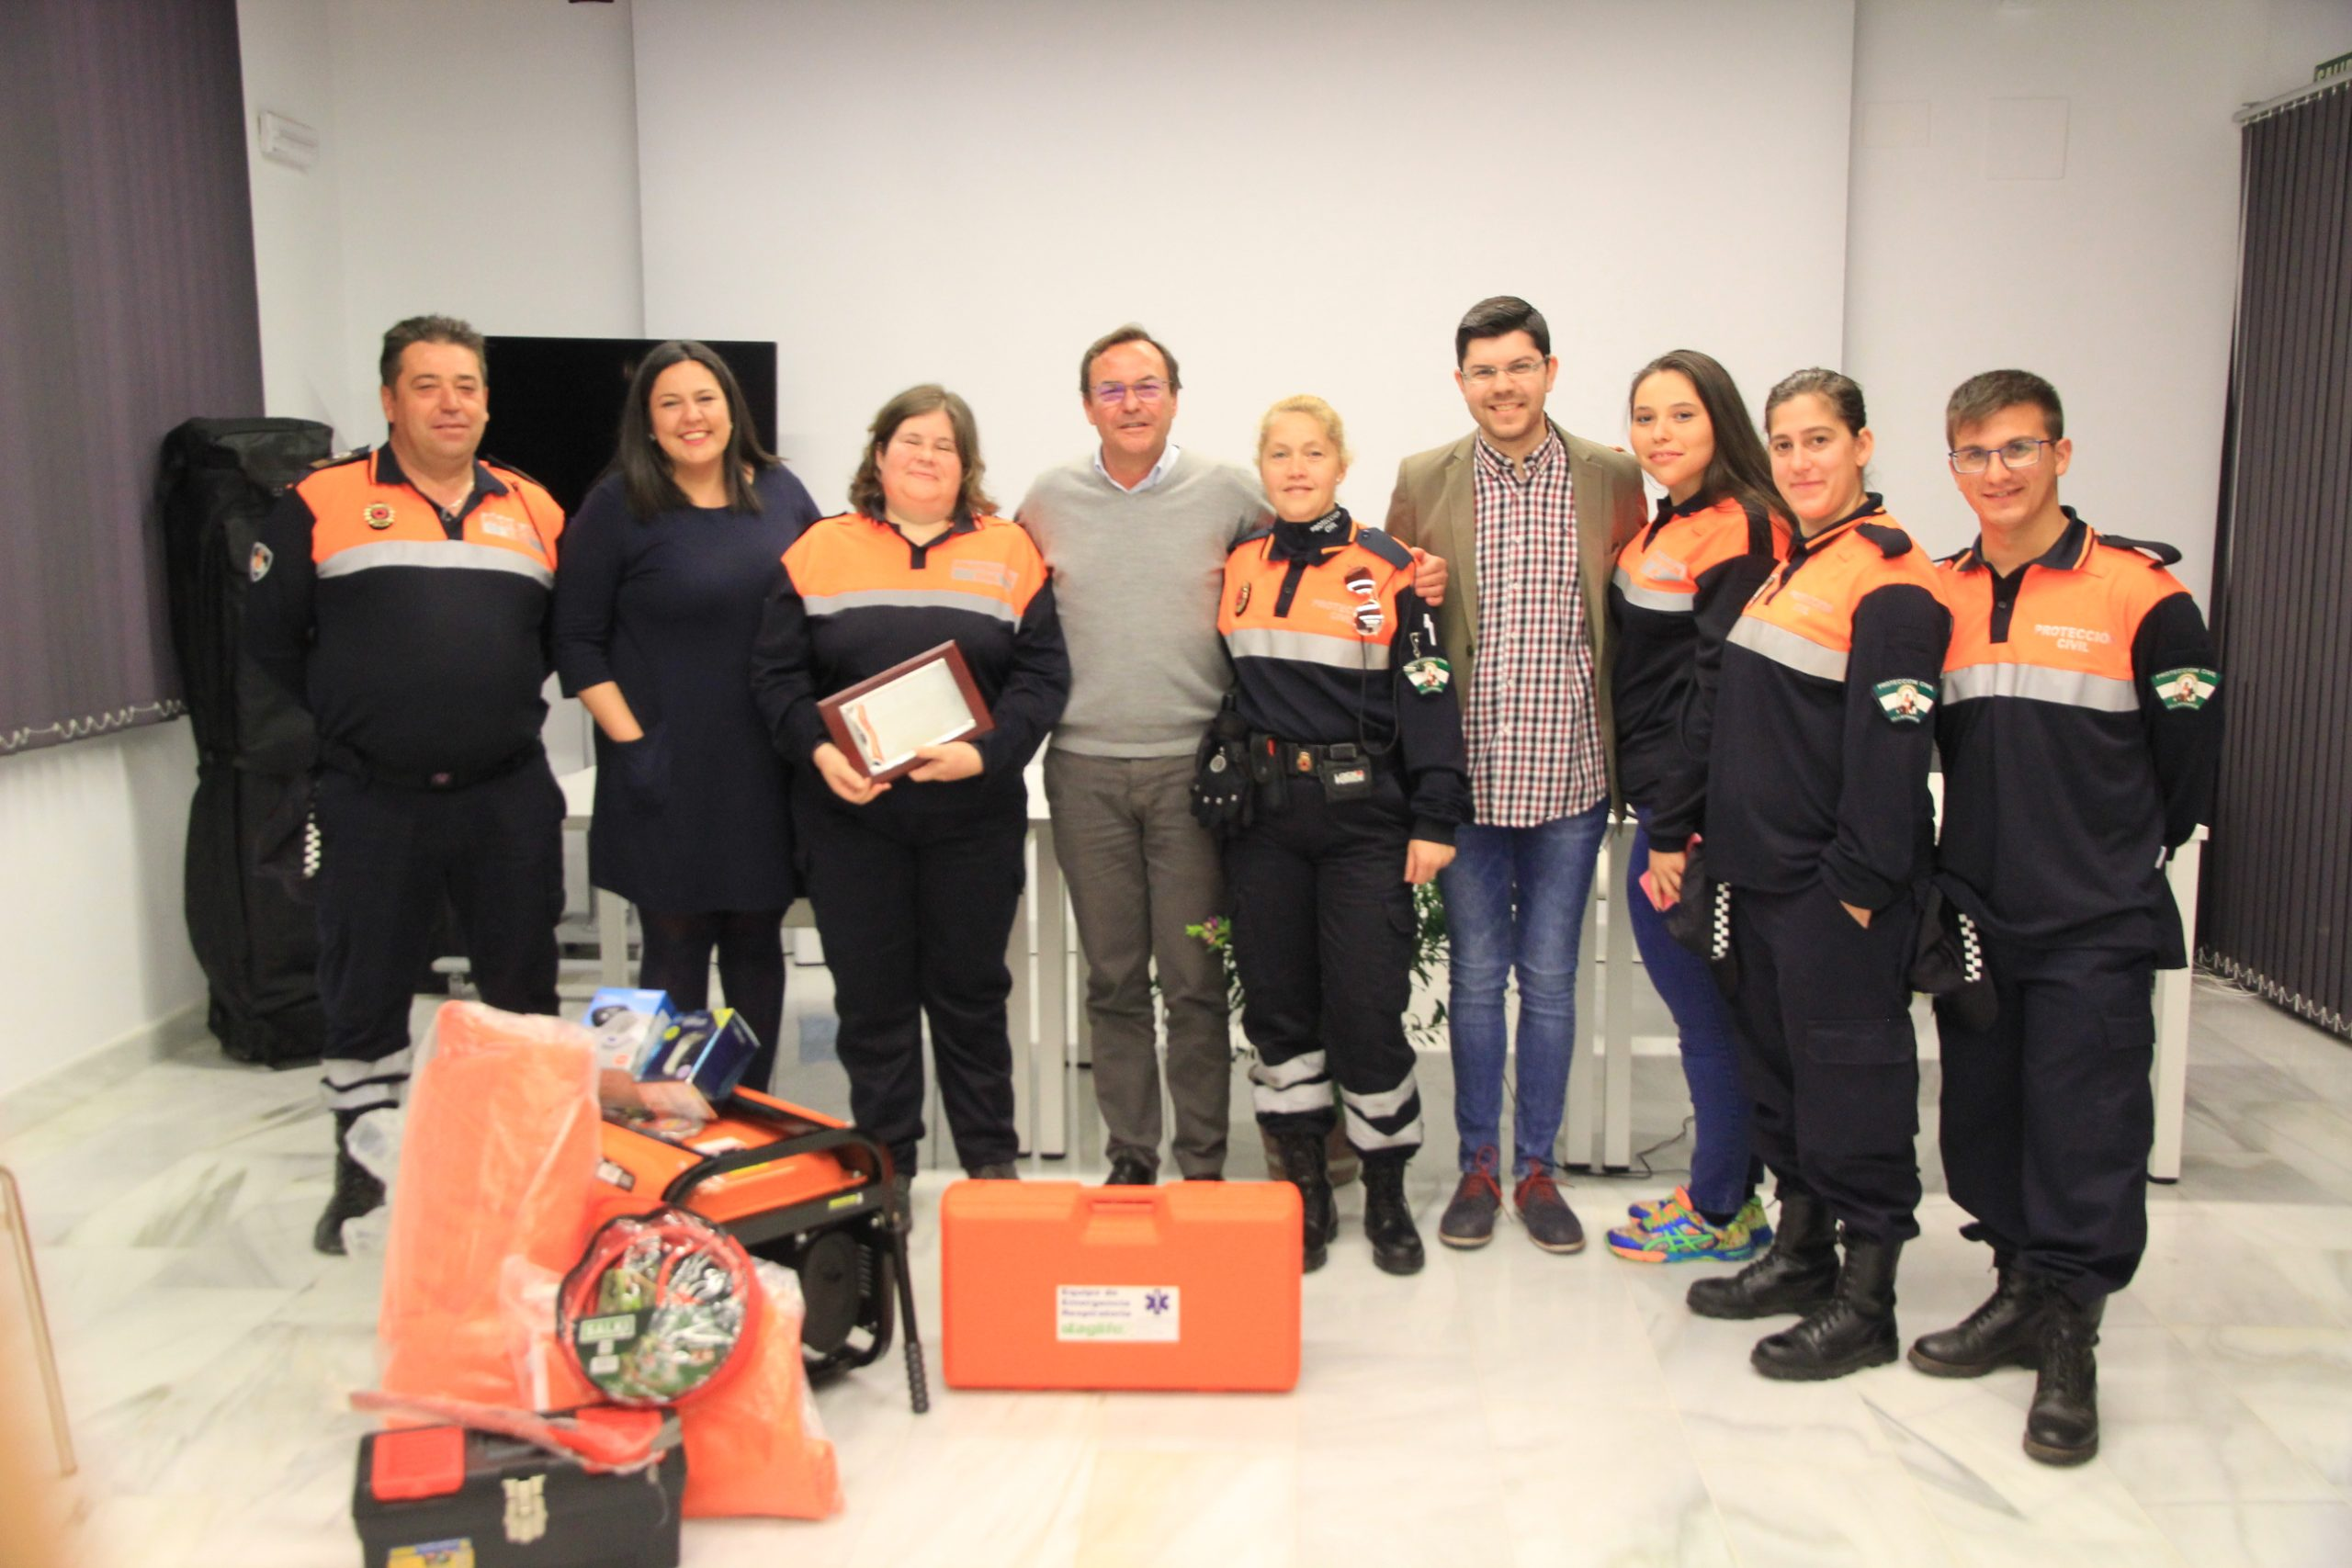 Entrega material agrupación Voluntarios Protección Civil 1